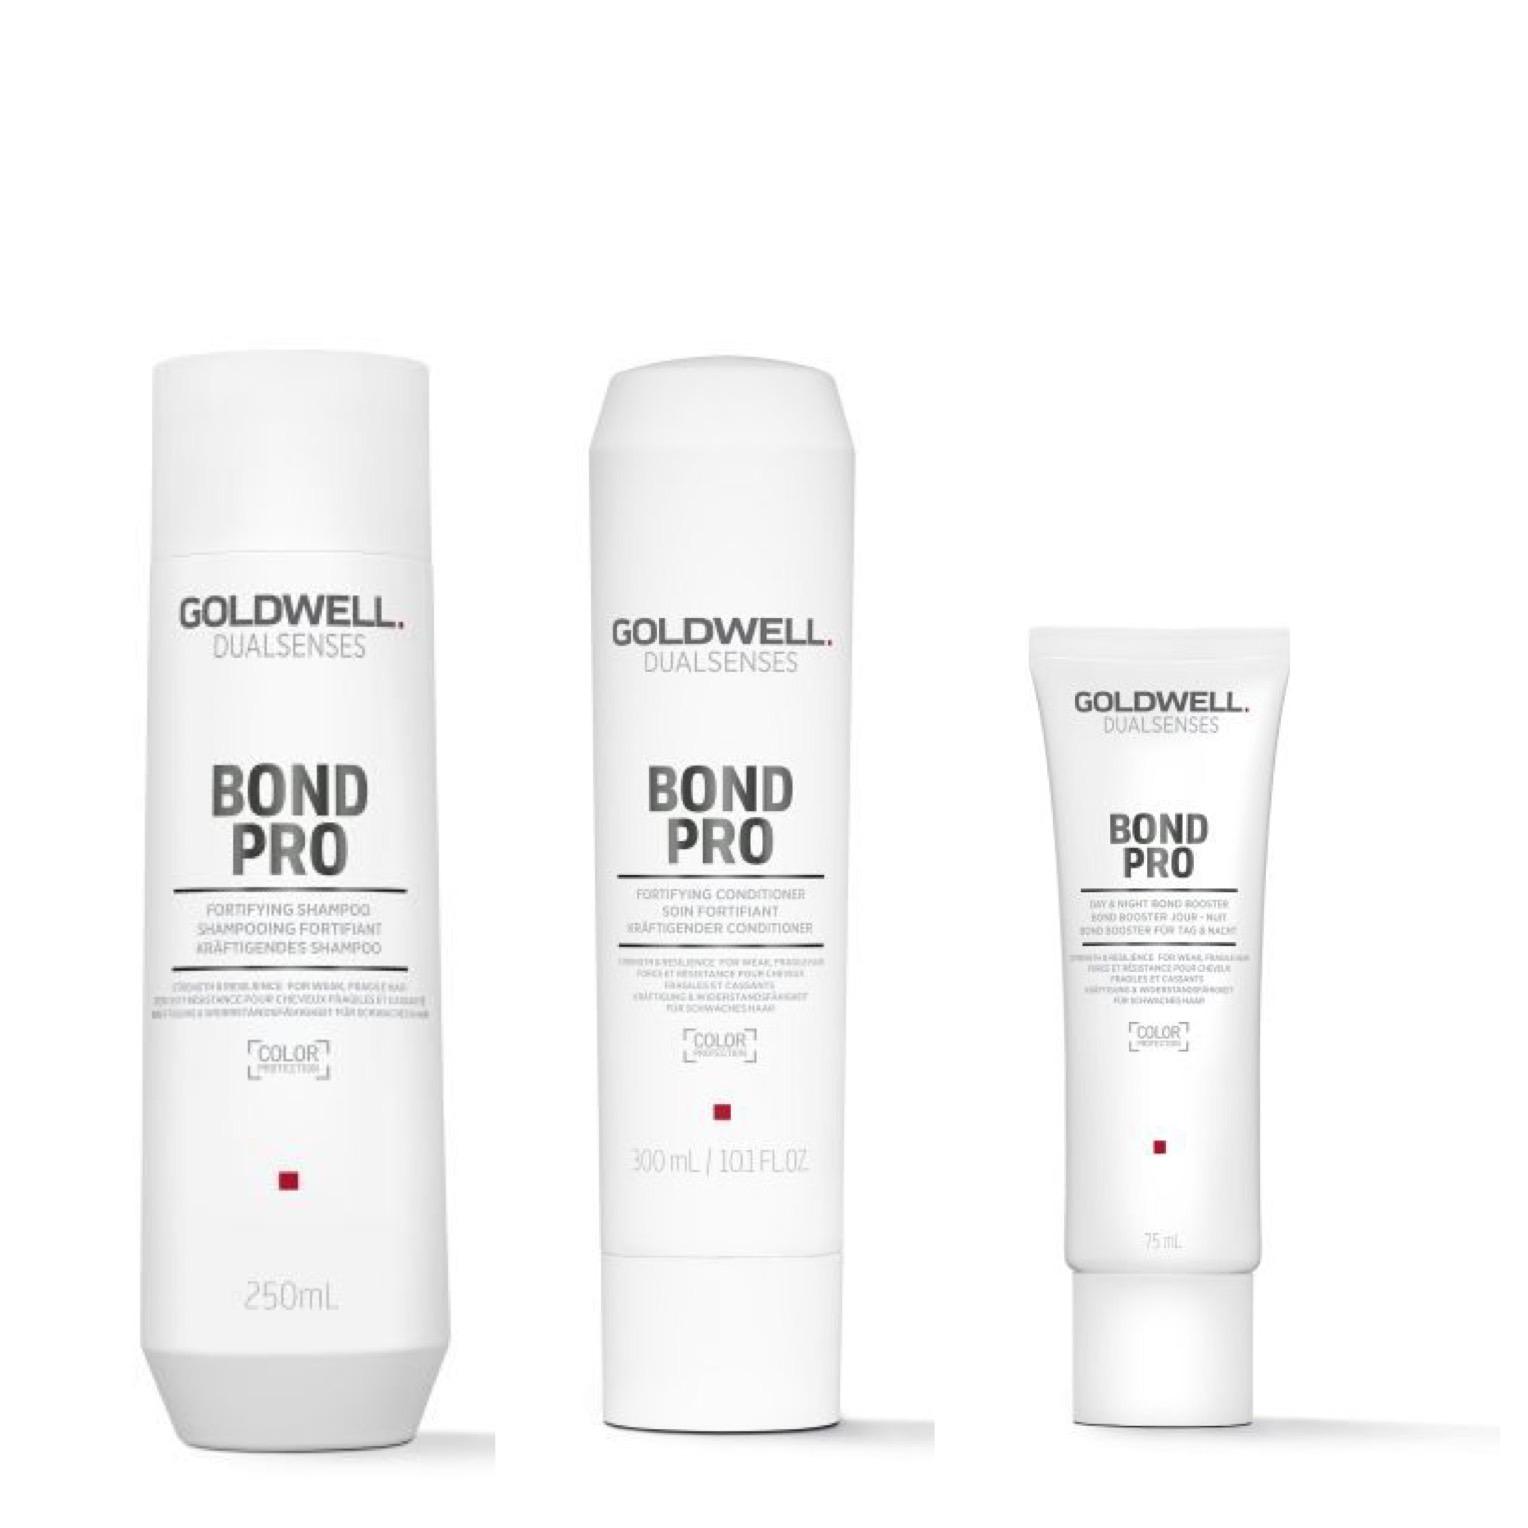 Goldwell Dualsenses Bond Pro Set - Shampoo 250ml + Conditioner 200ml + Bond Booster für Tag & Nacht 75ml